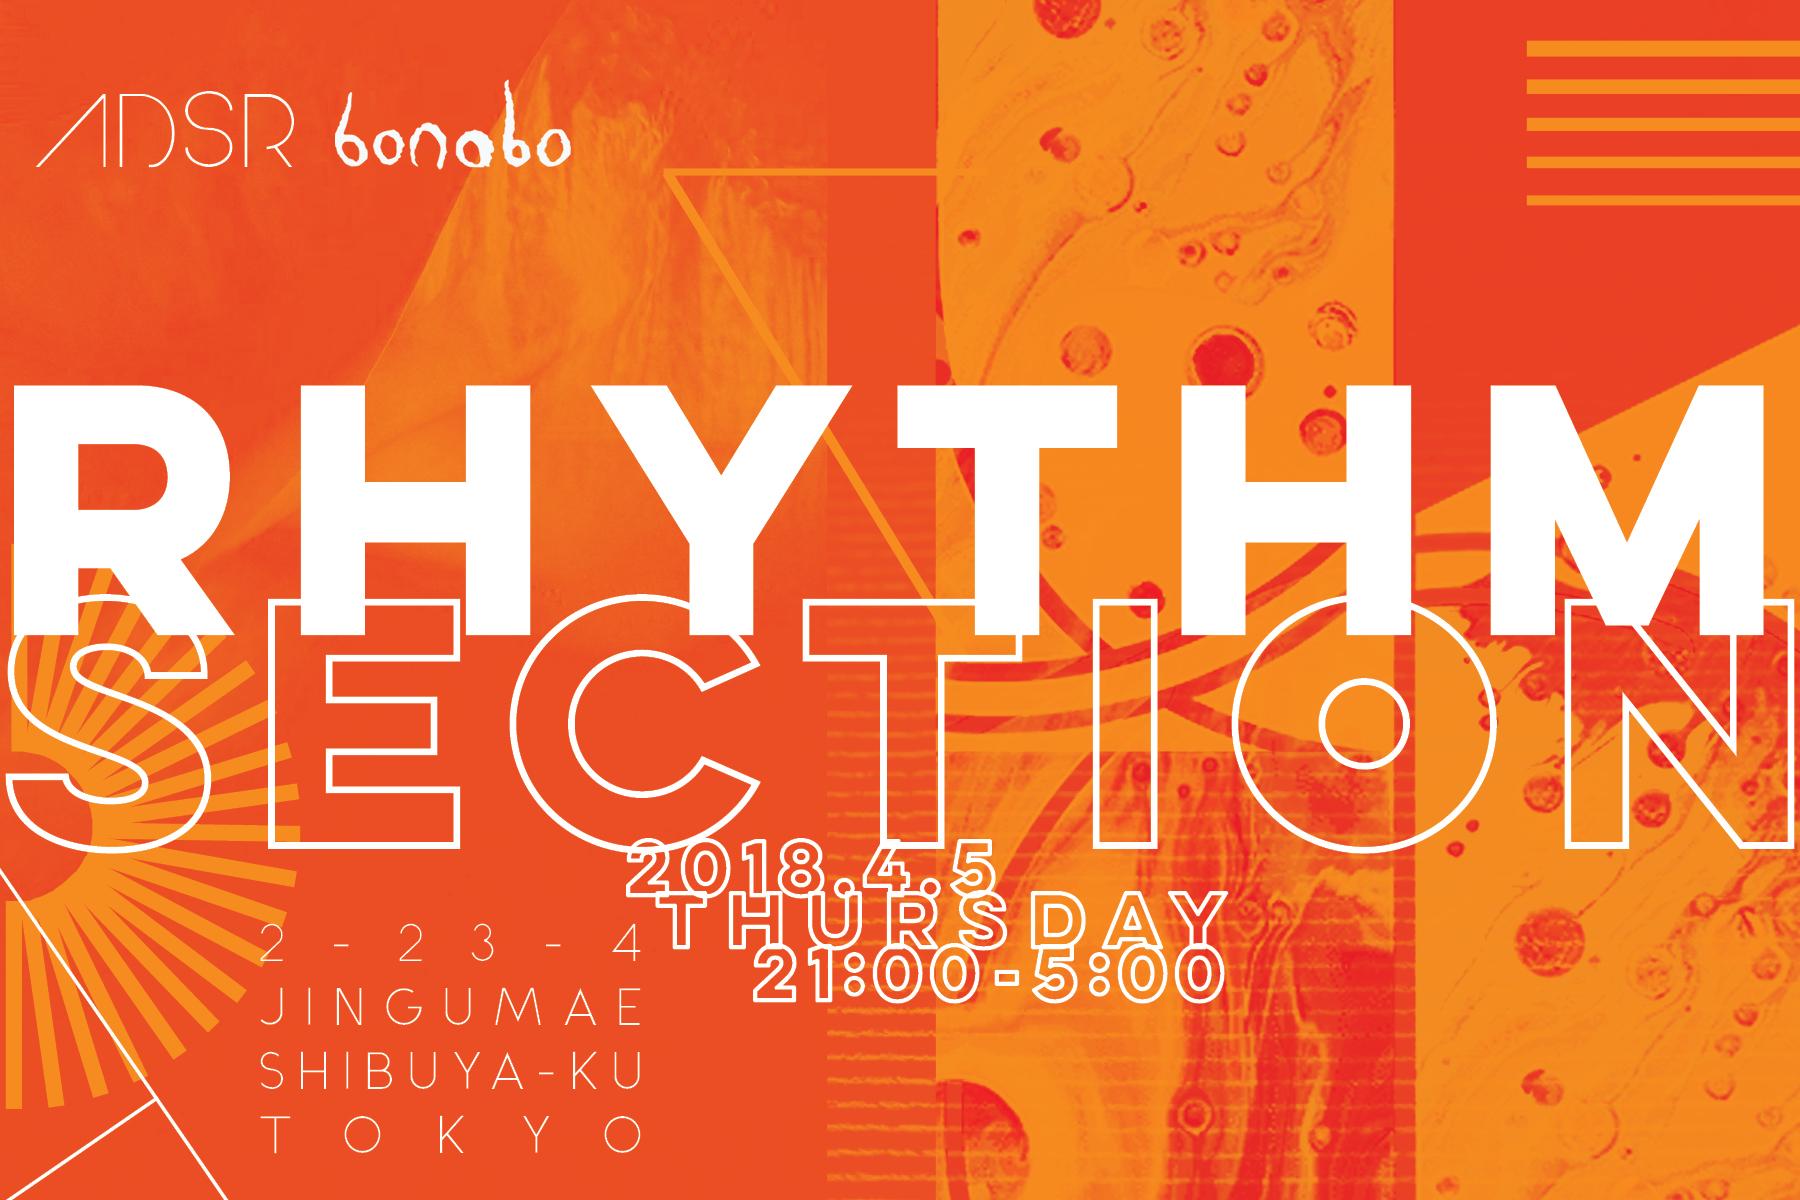 RhythmSection4x6_print1.jpg